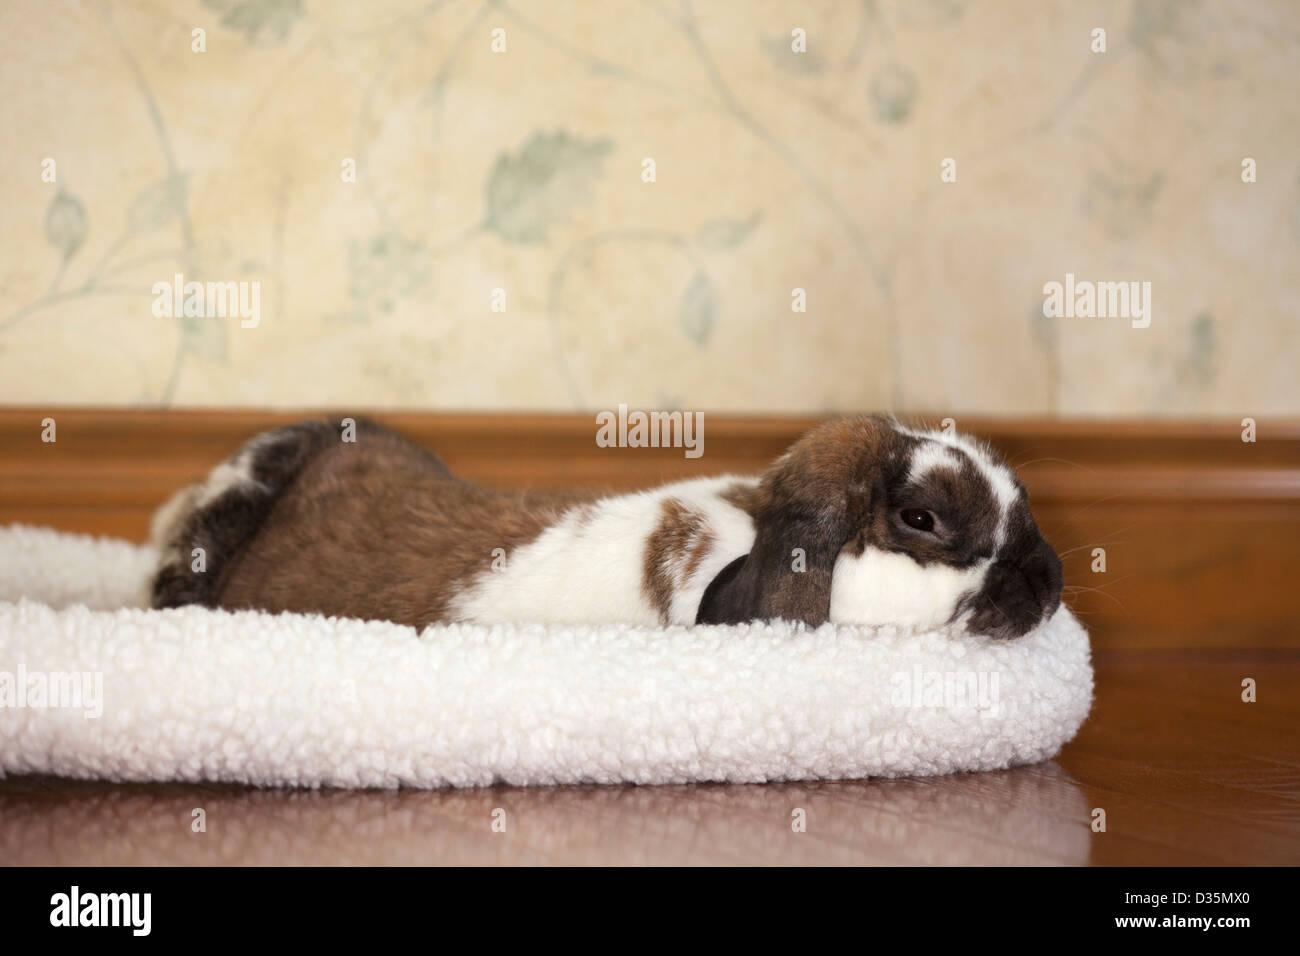 Holland lop pet rabbit sleeping in his fleece bed in a hotel room - Stock Image